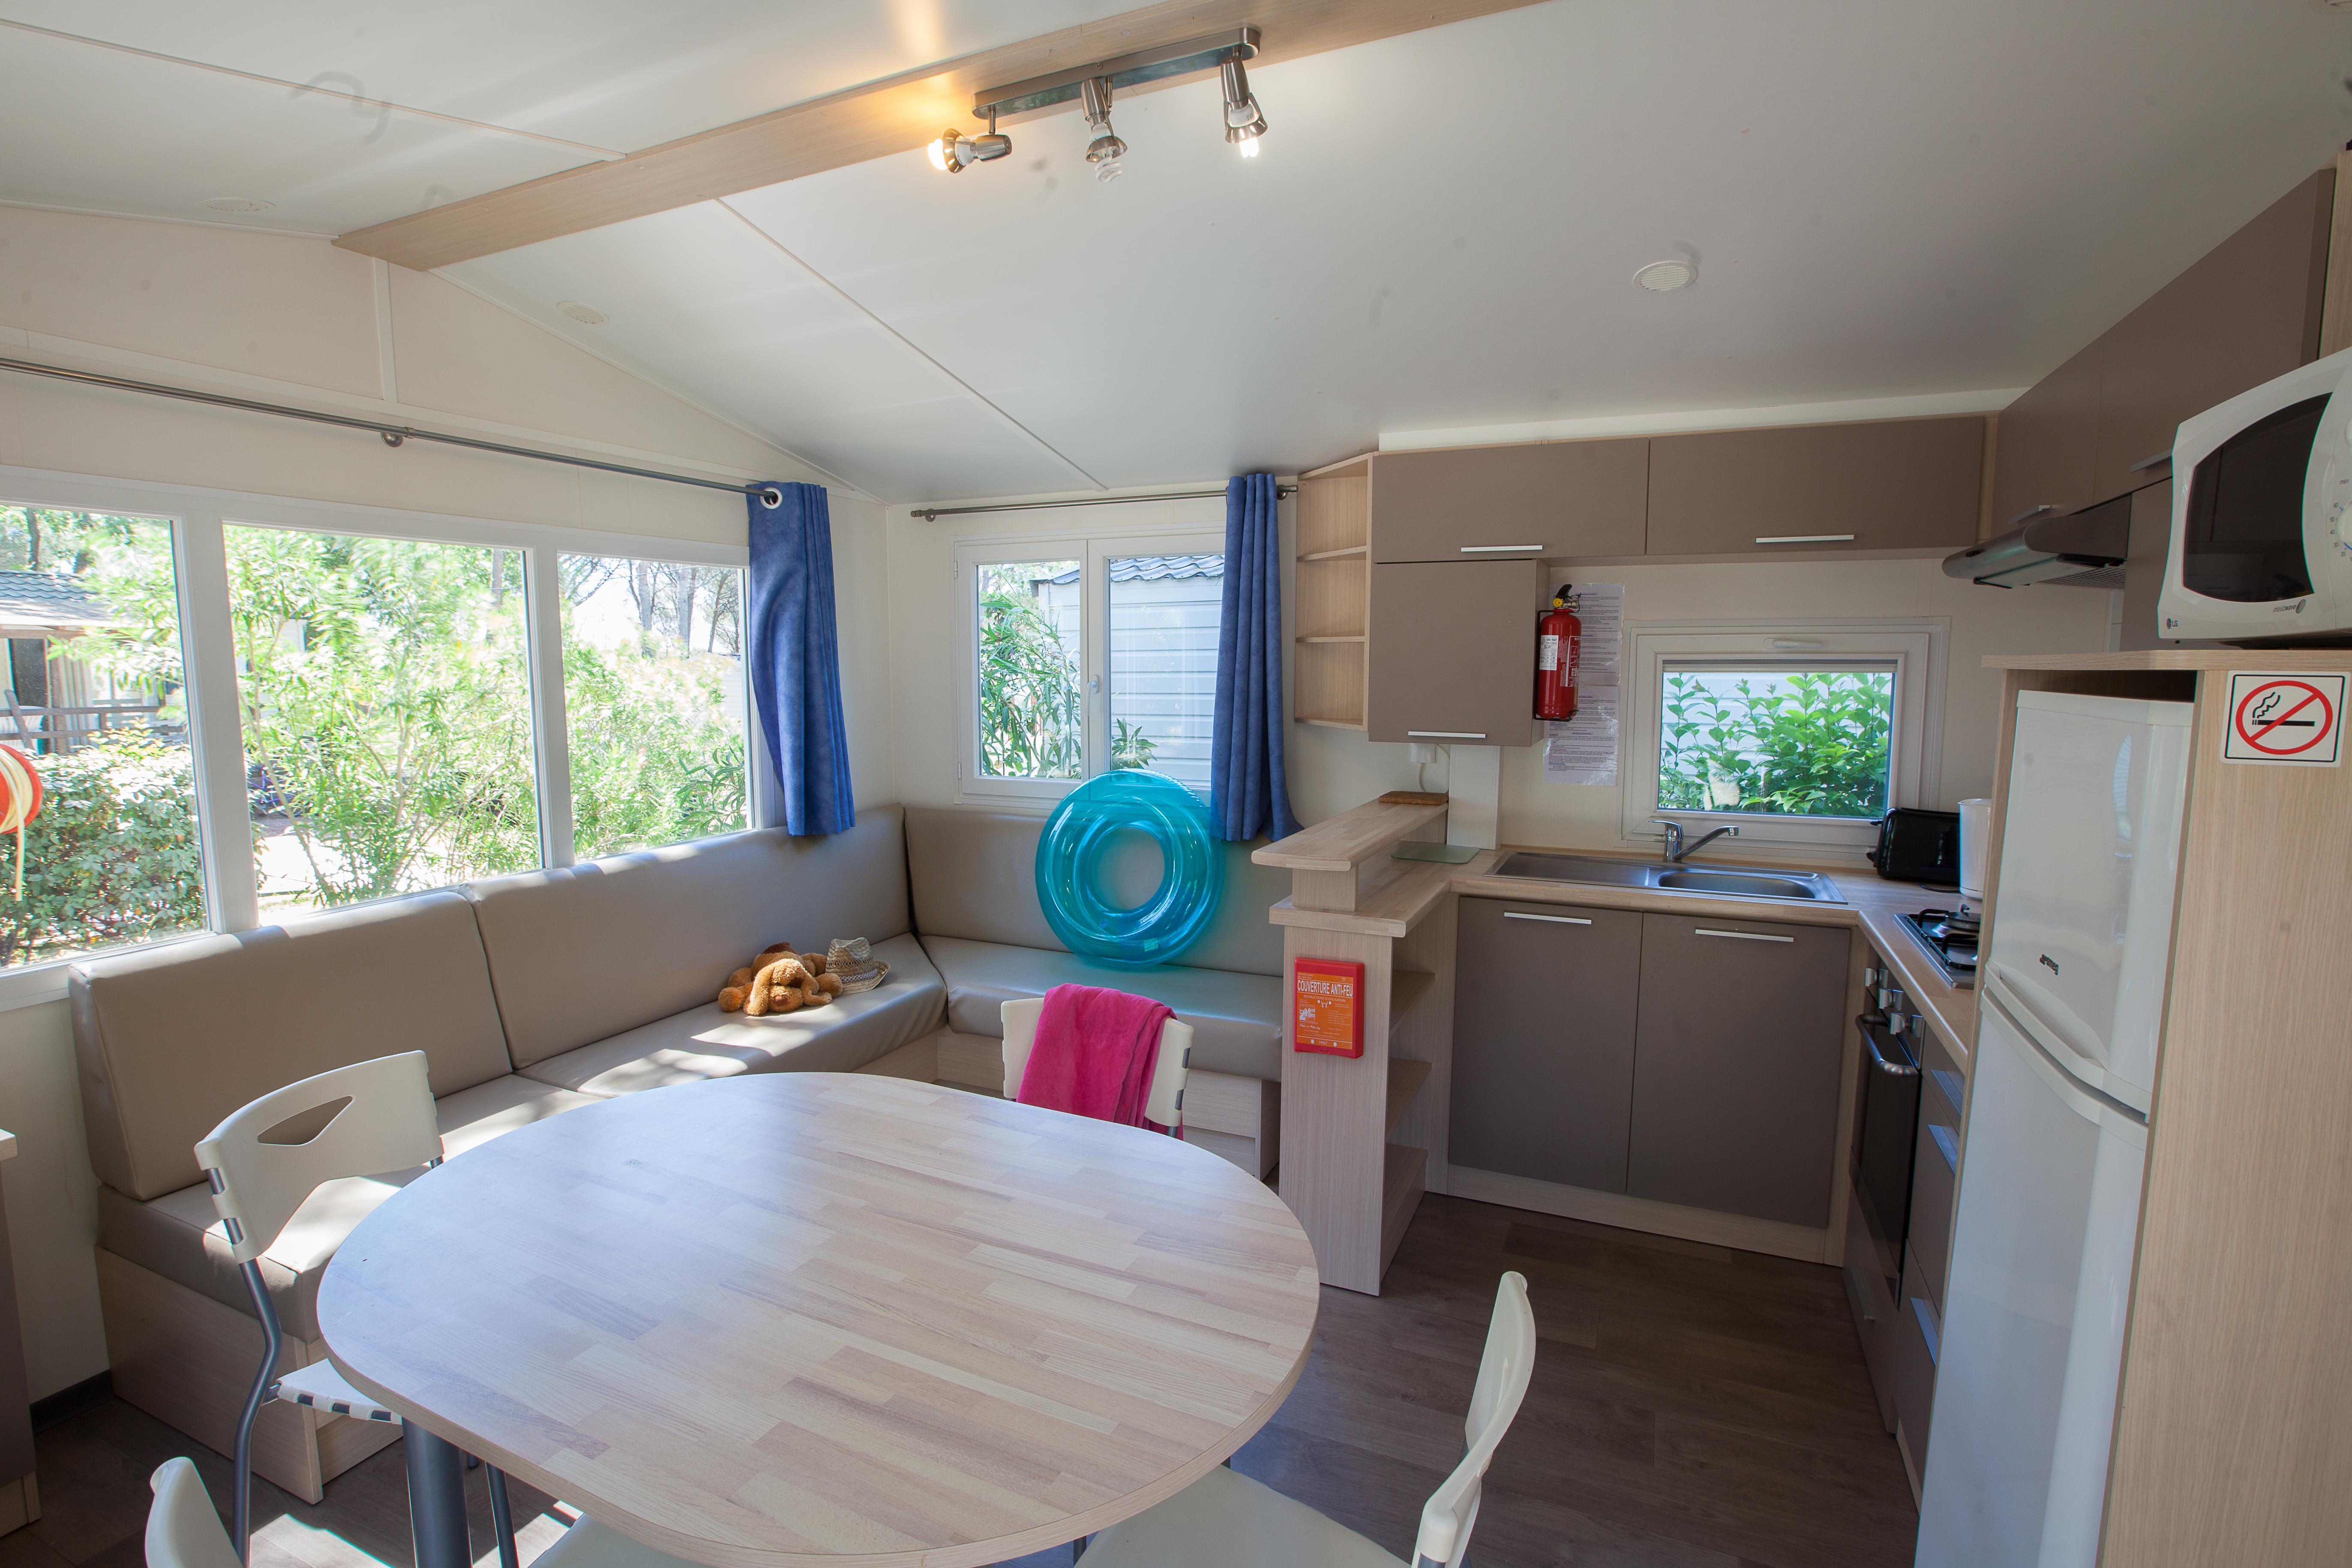 Location - Mobil-Home Les Pins 32 M² - 2 Chambres - Camping La Baume La Palmeraie